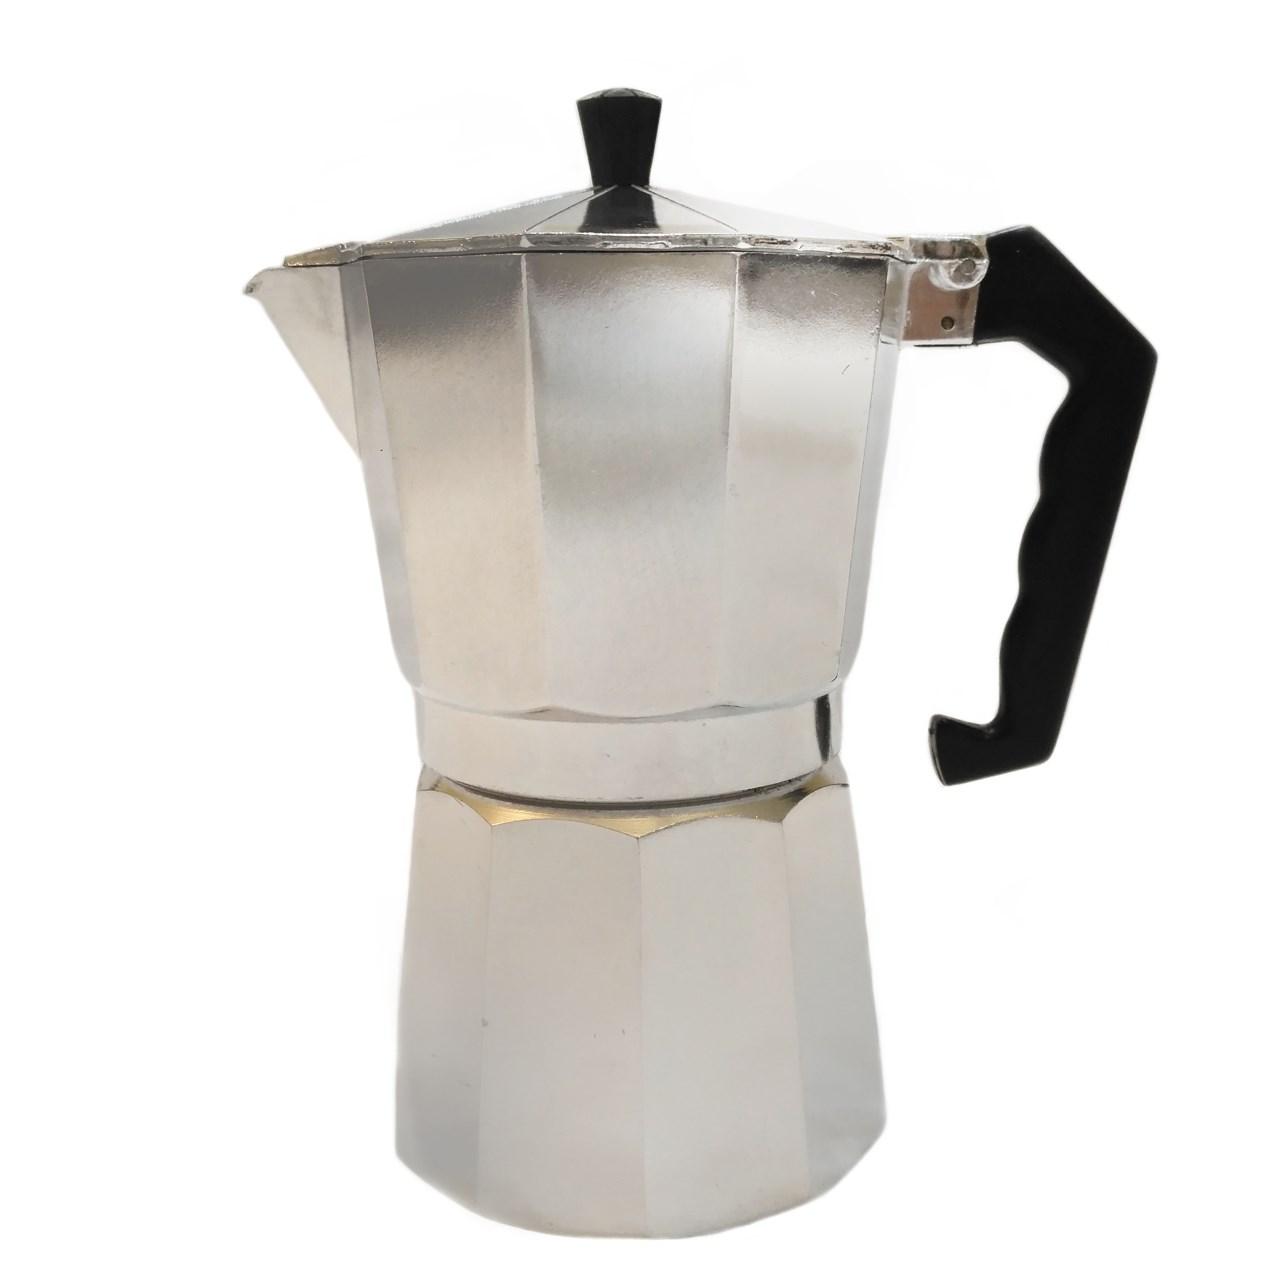 قهوه جوش برساد مدل A043 نه کاپ